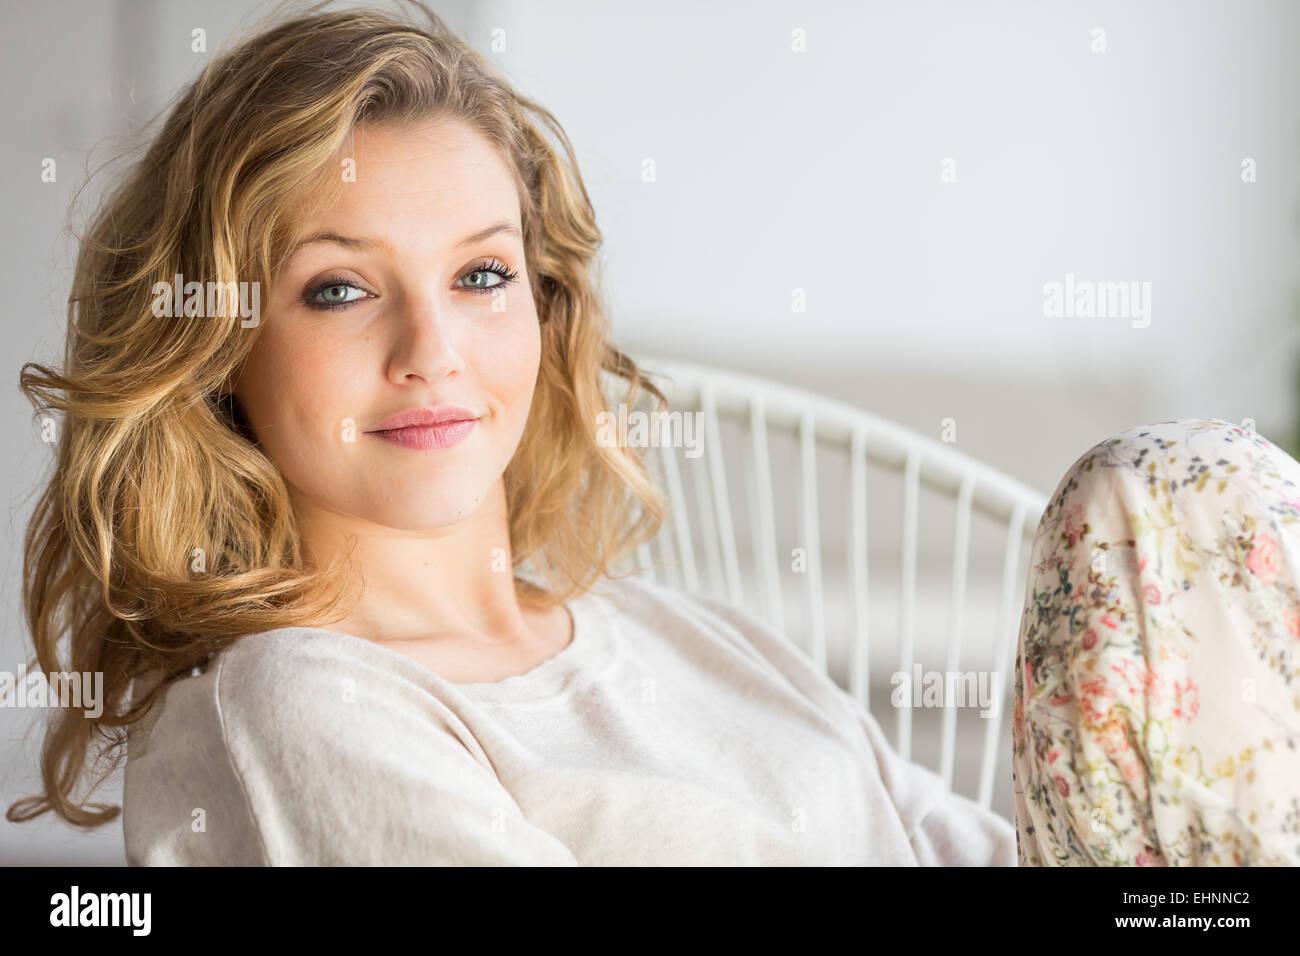 Portrait of a woman. - Stock Image